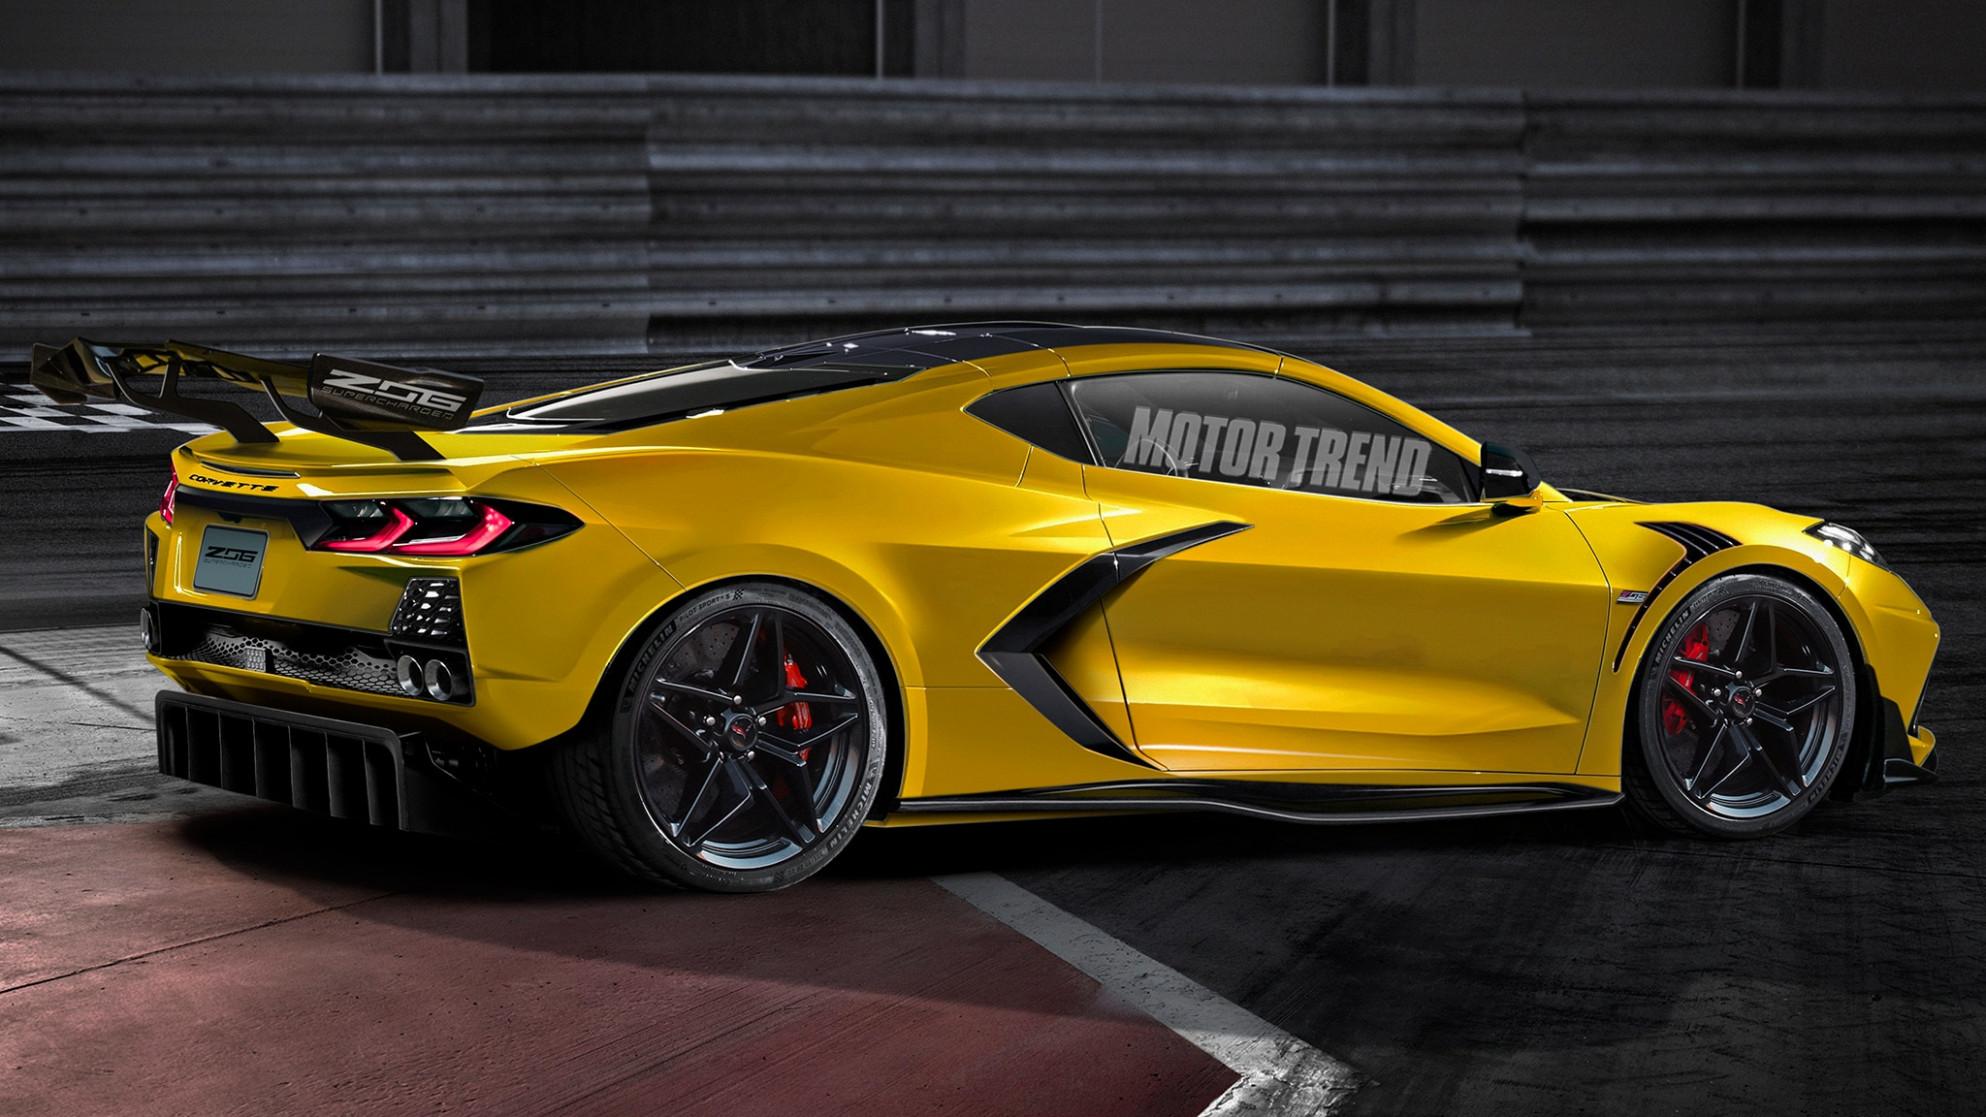 Spesification 2022 Chevy Corvette Zora Zr1